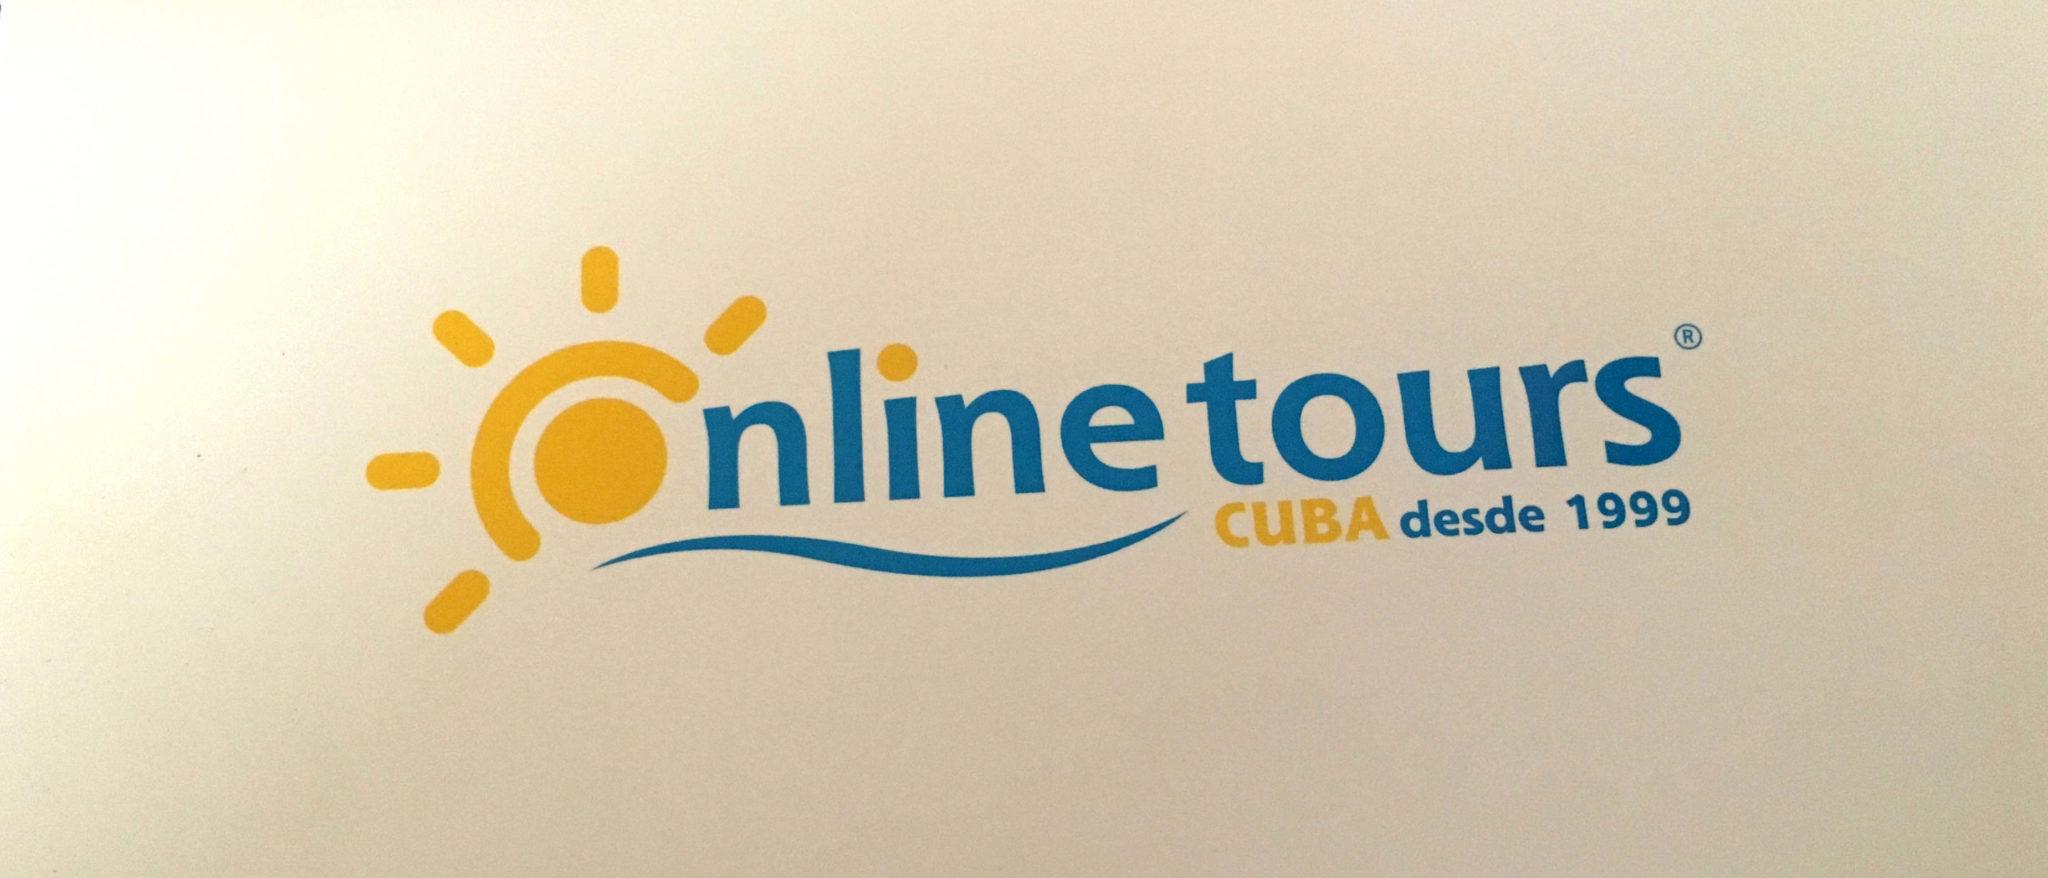 visado para viajar a cuba onlinetours